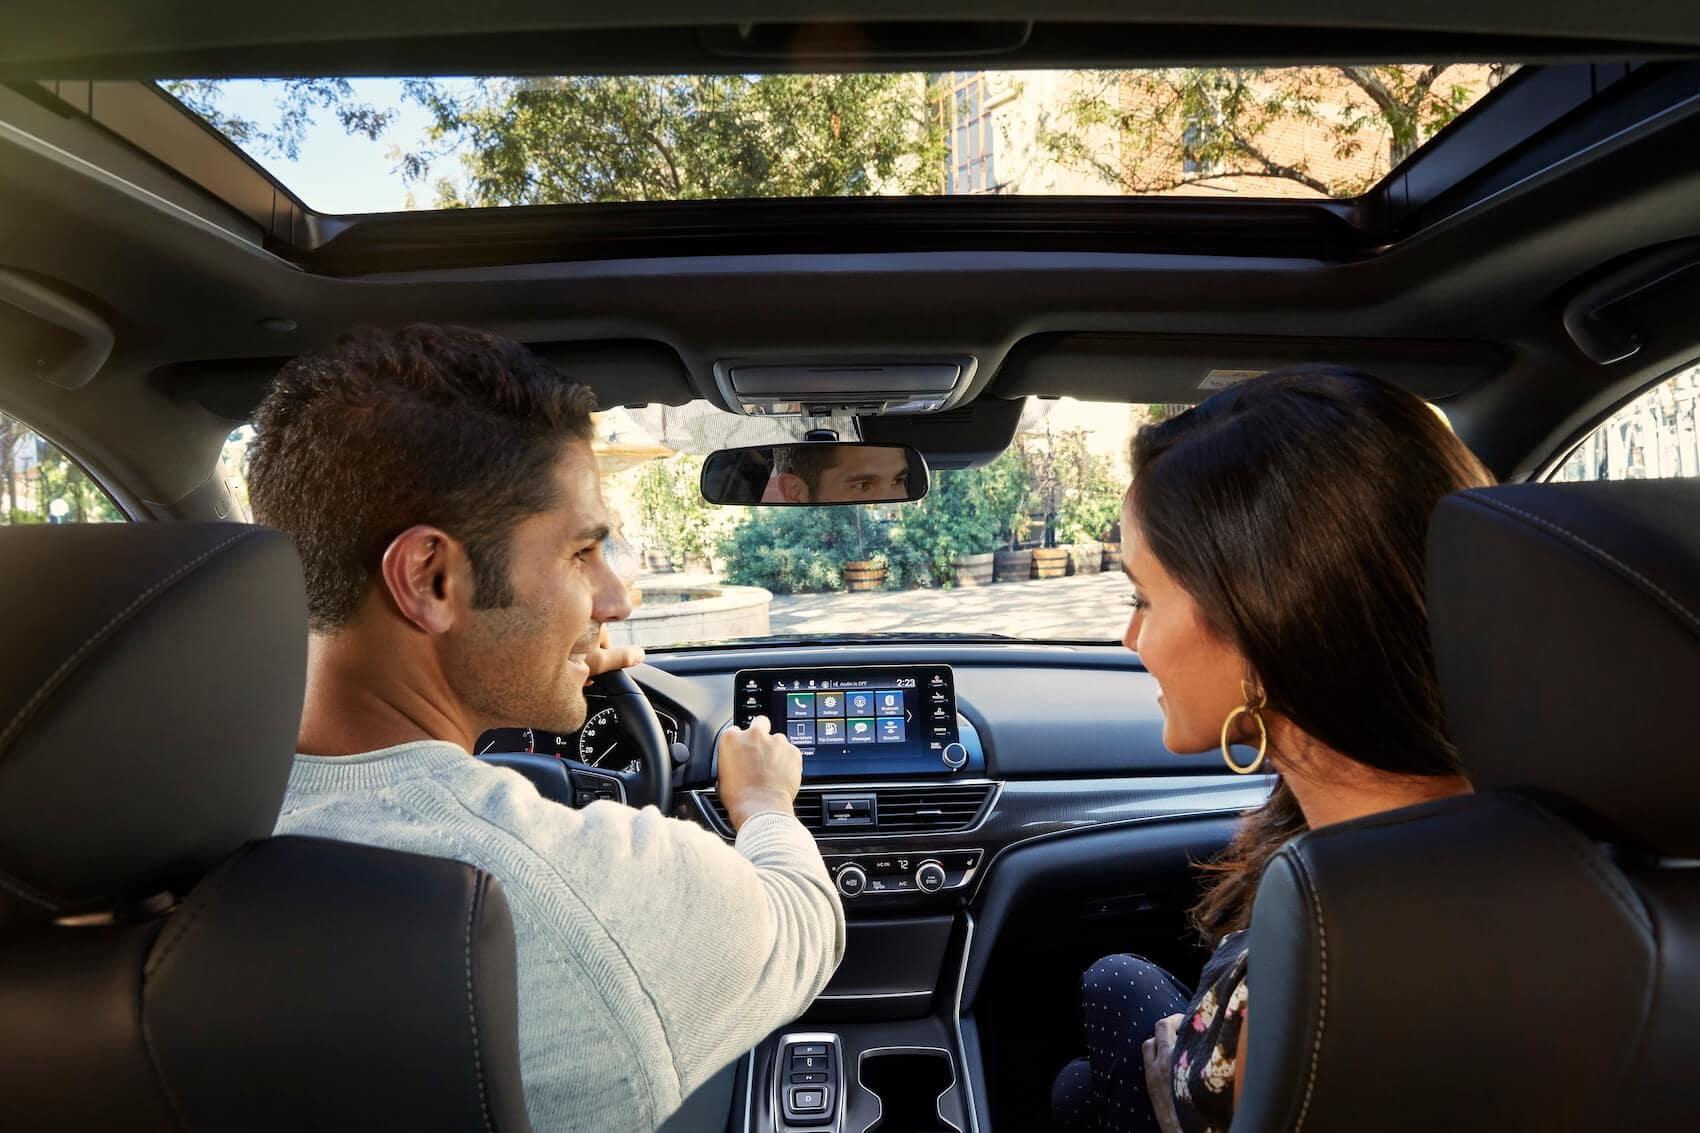 Honda Accord: Technology